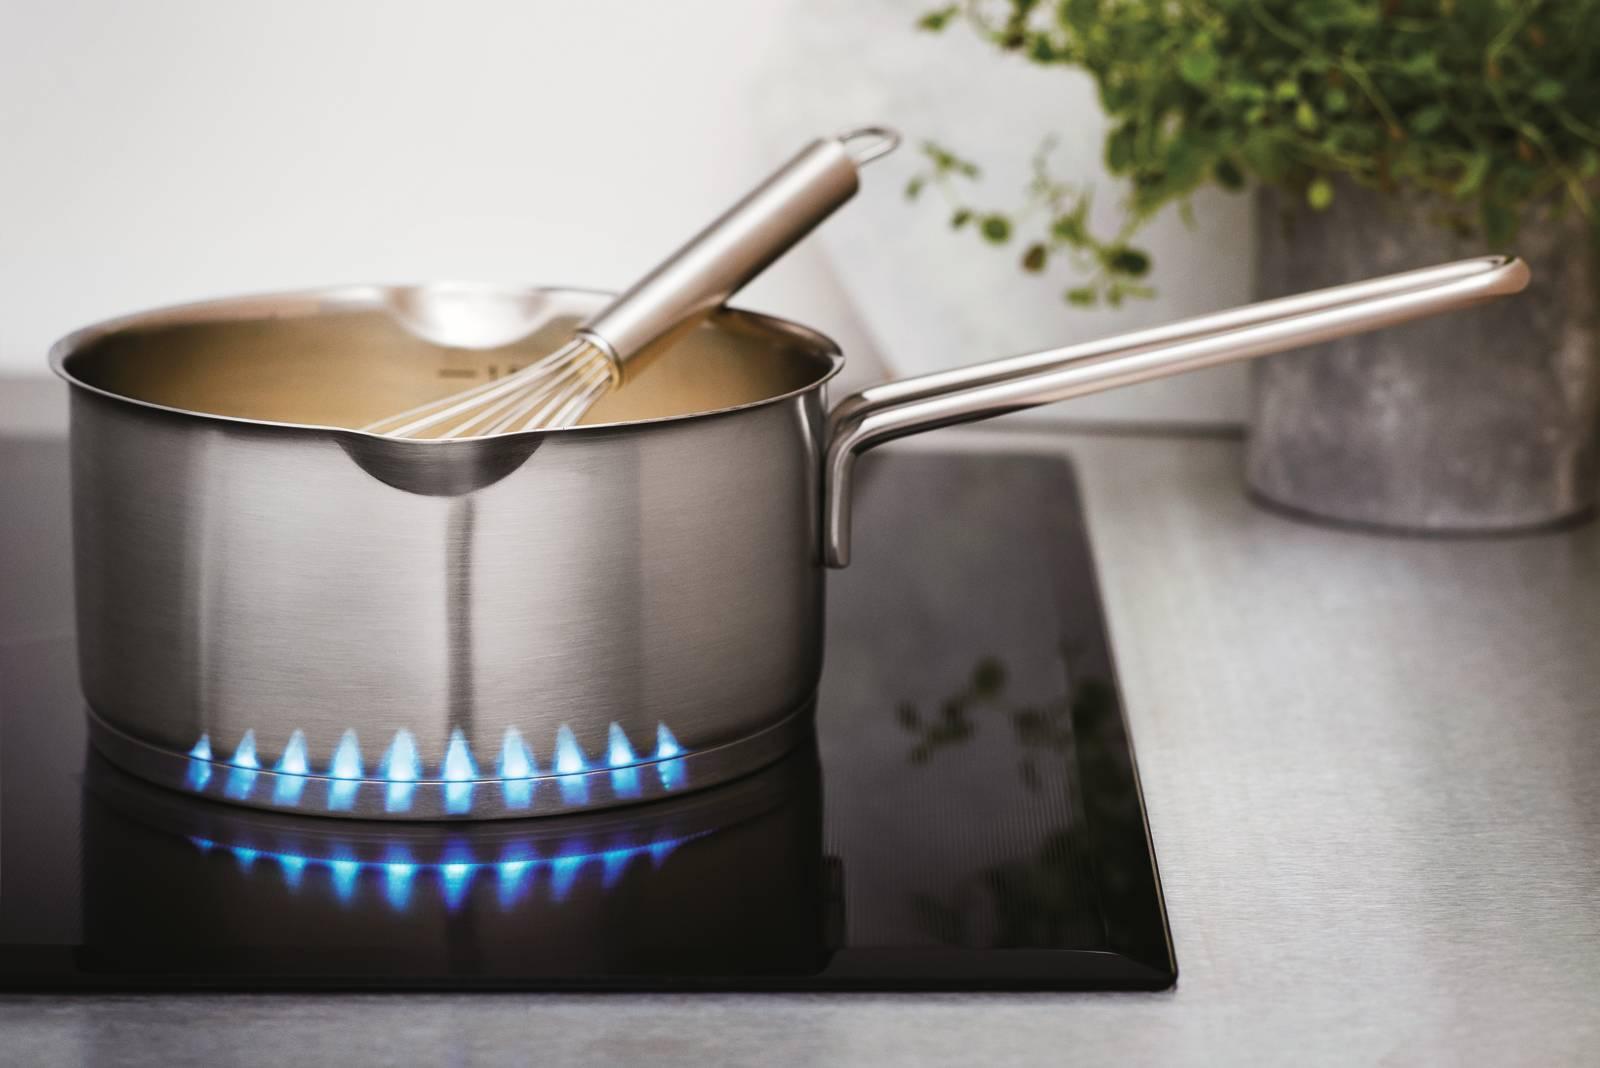 Piano Cottura Induzione O Gas cottura a gas o induzione? 10 piani a confronto - cose di casa